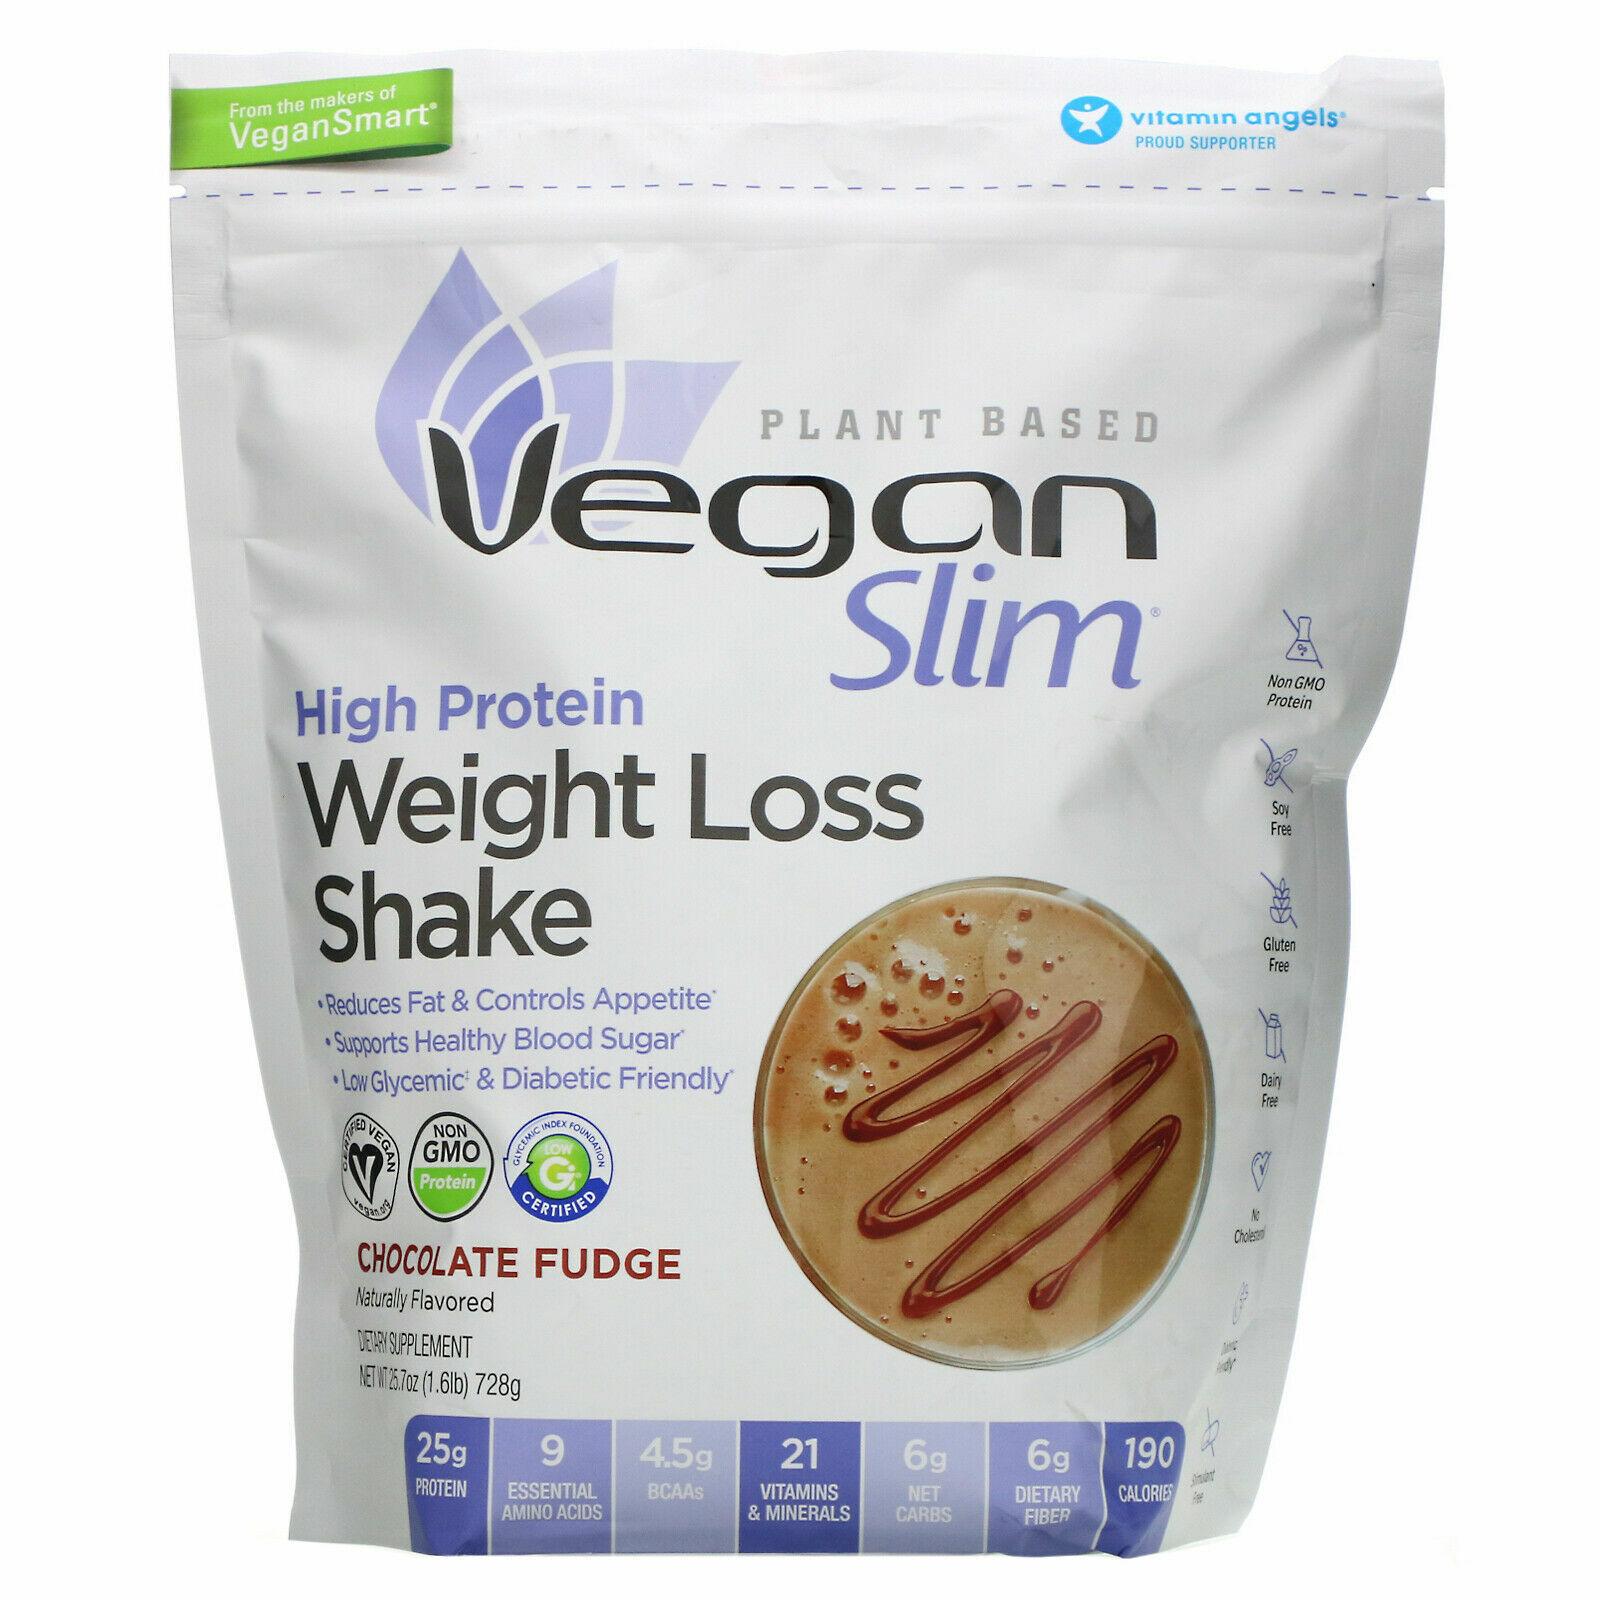 Naturade High Protein Weight Loss Shake, Chocolate Fudge, 1.6 lb